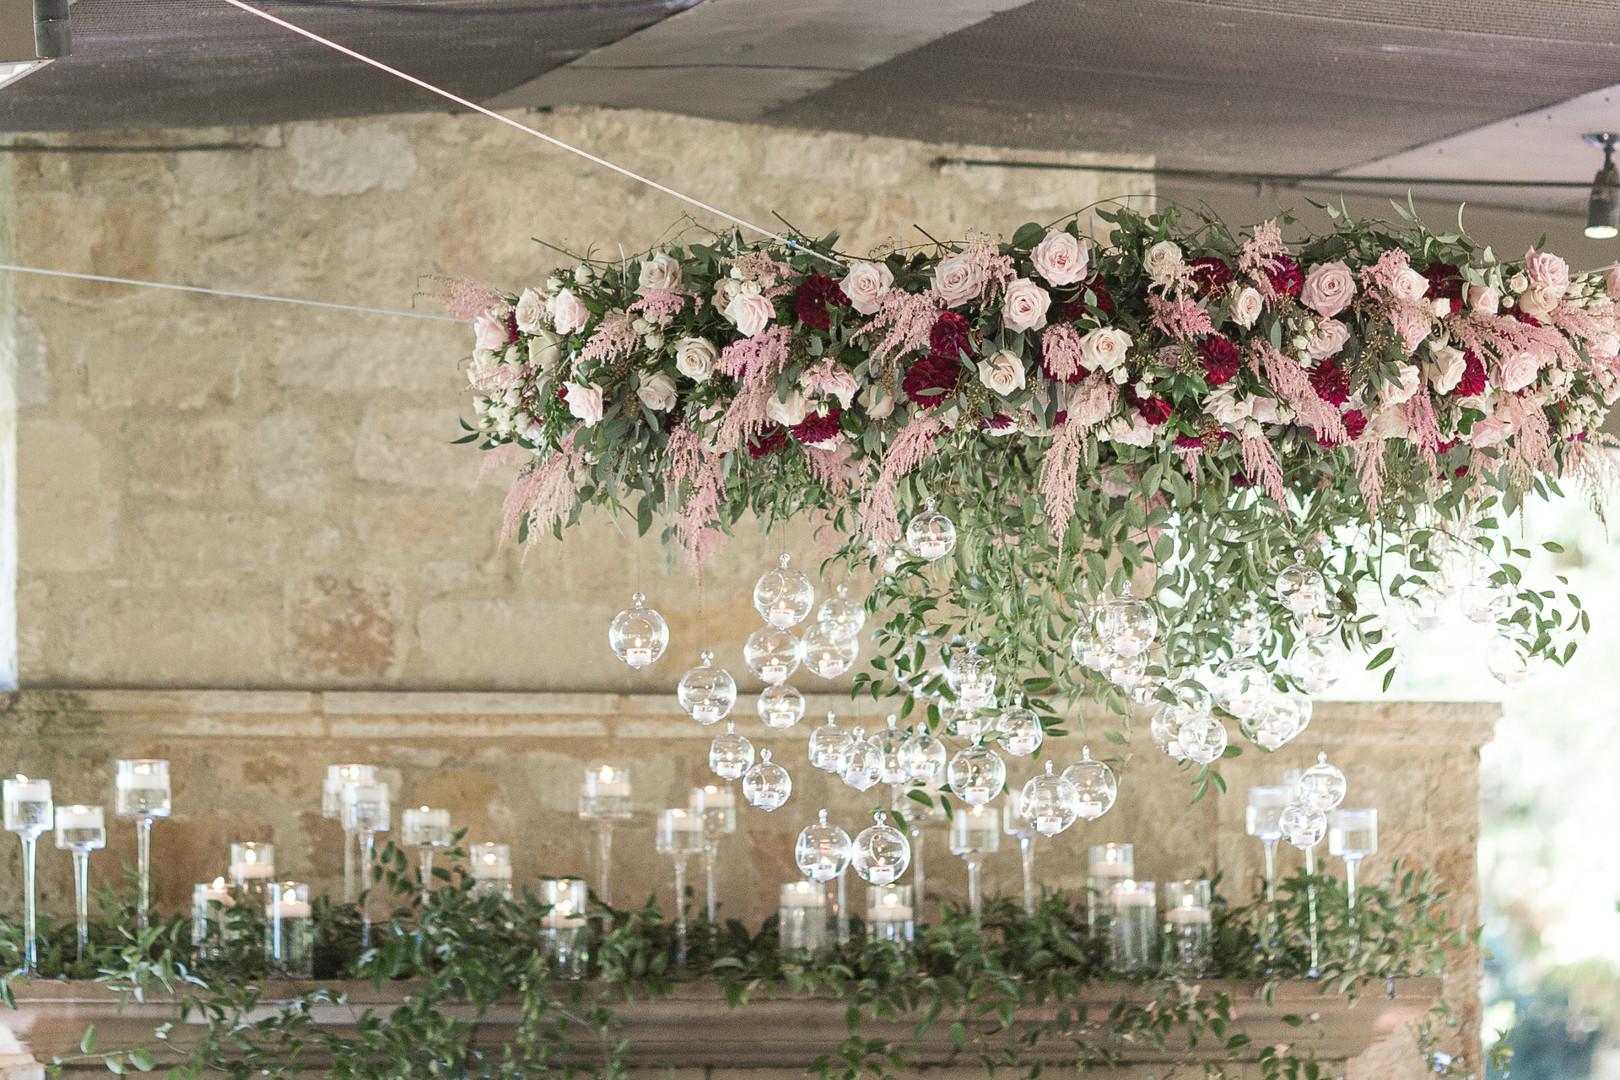 Wedding reception decor hanging florals